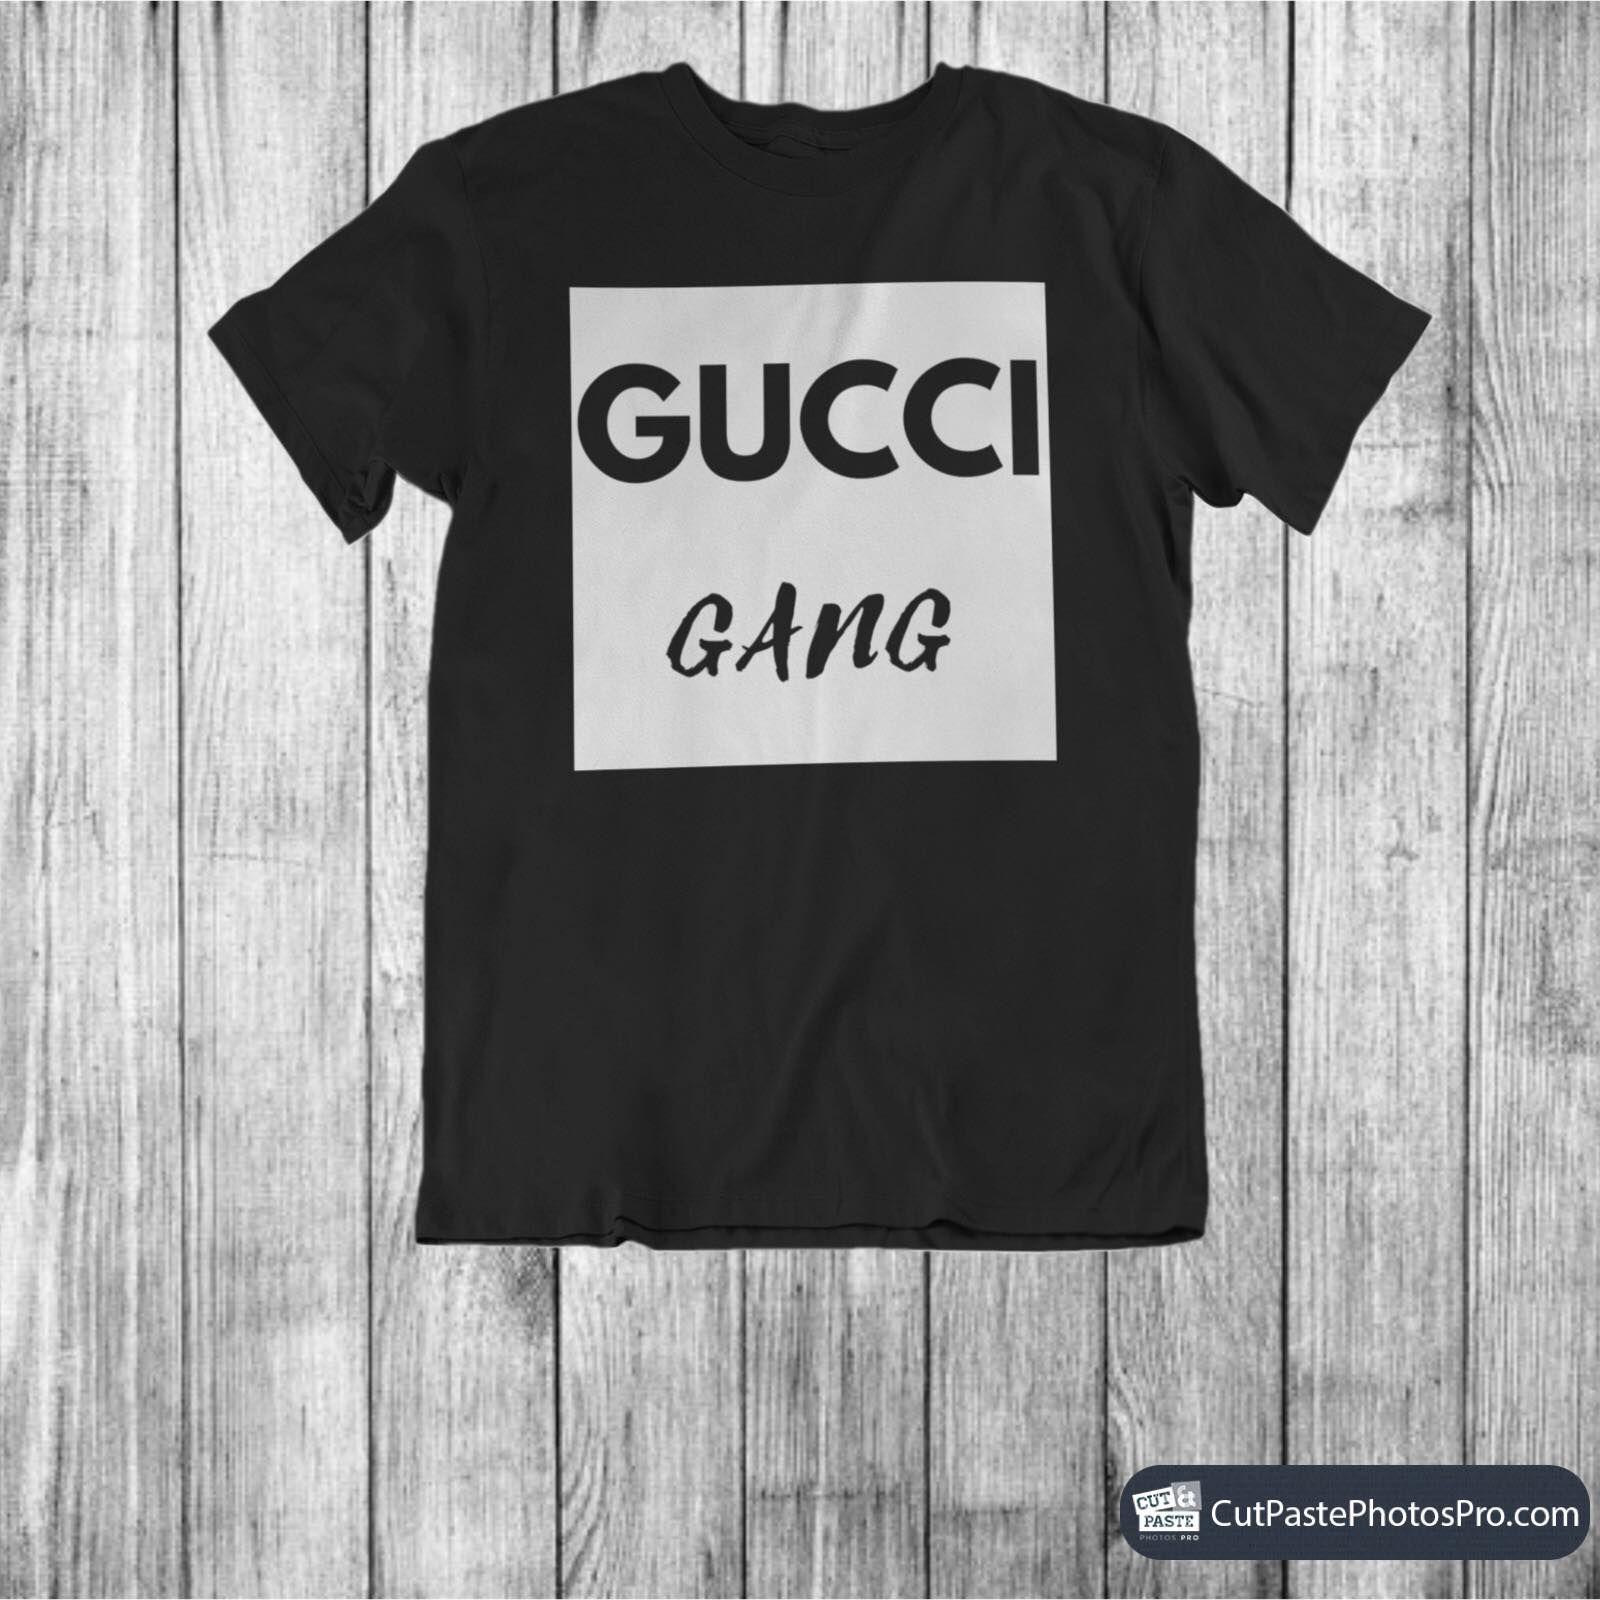 73a58d61 Gucci Gang - Vintage Gucci - Gucci Tshirt - Gucci Inspired - Womens Tshirt  - Mens Tshirt - Designer Inspired - Gucci Gang Unisex Tee